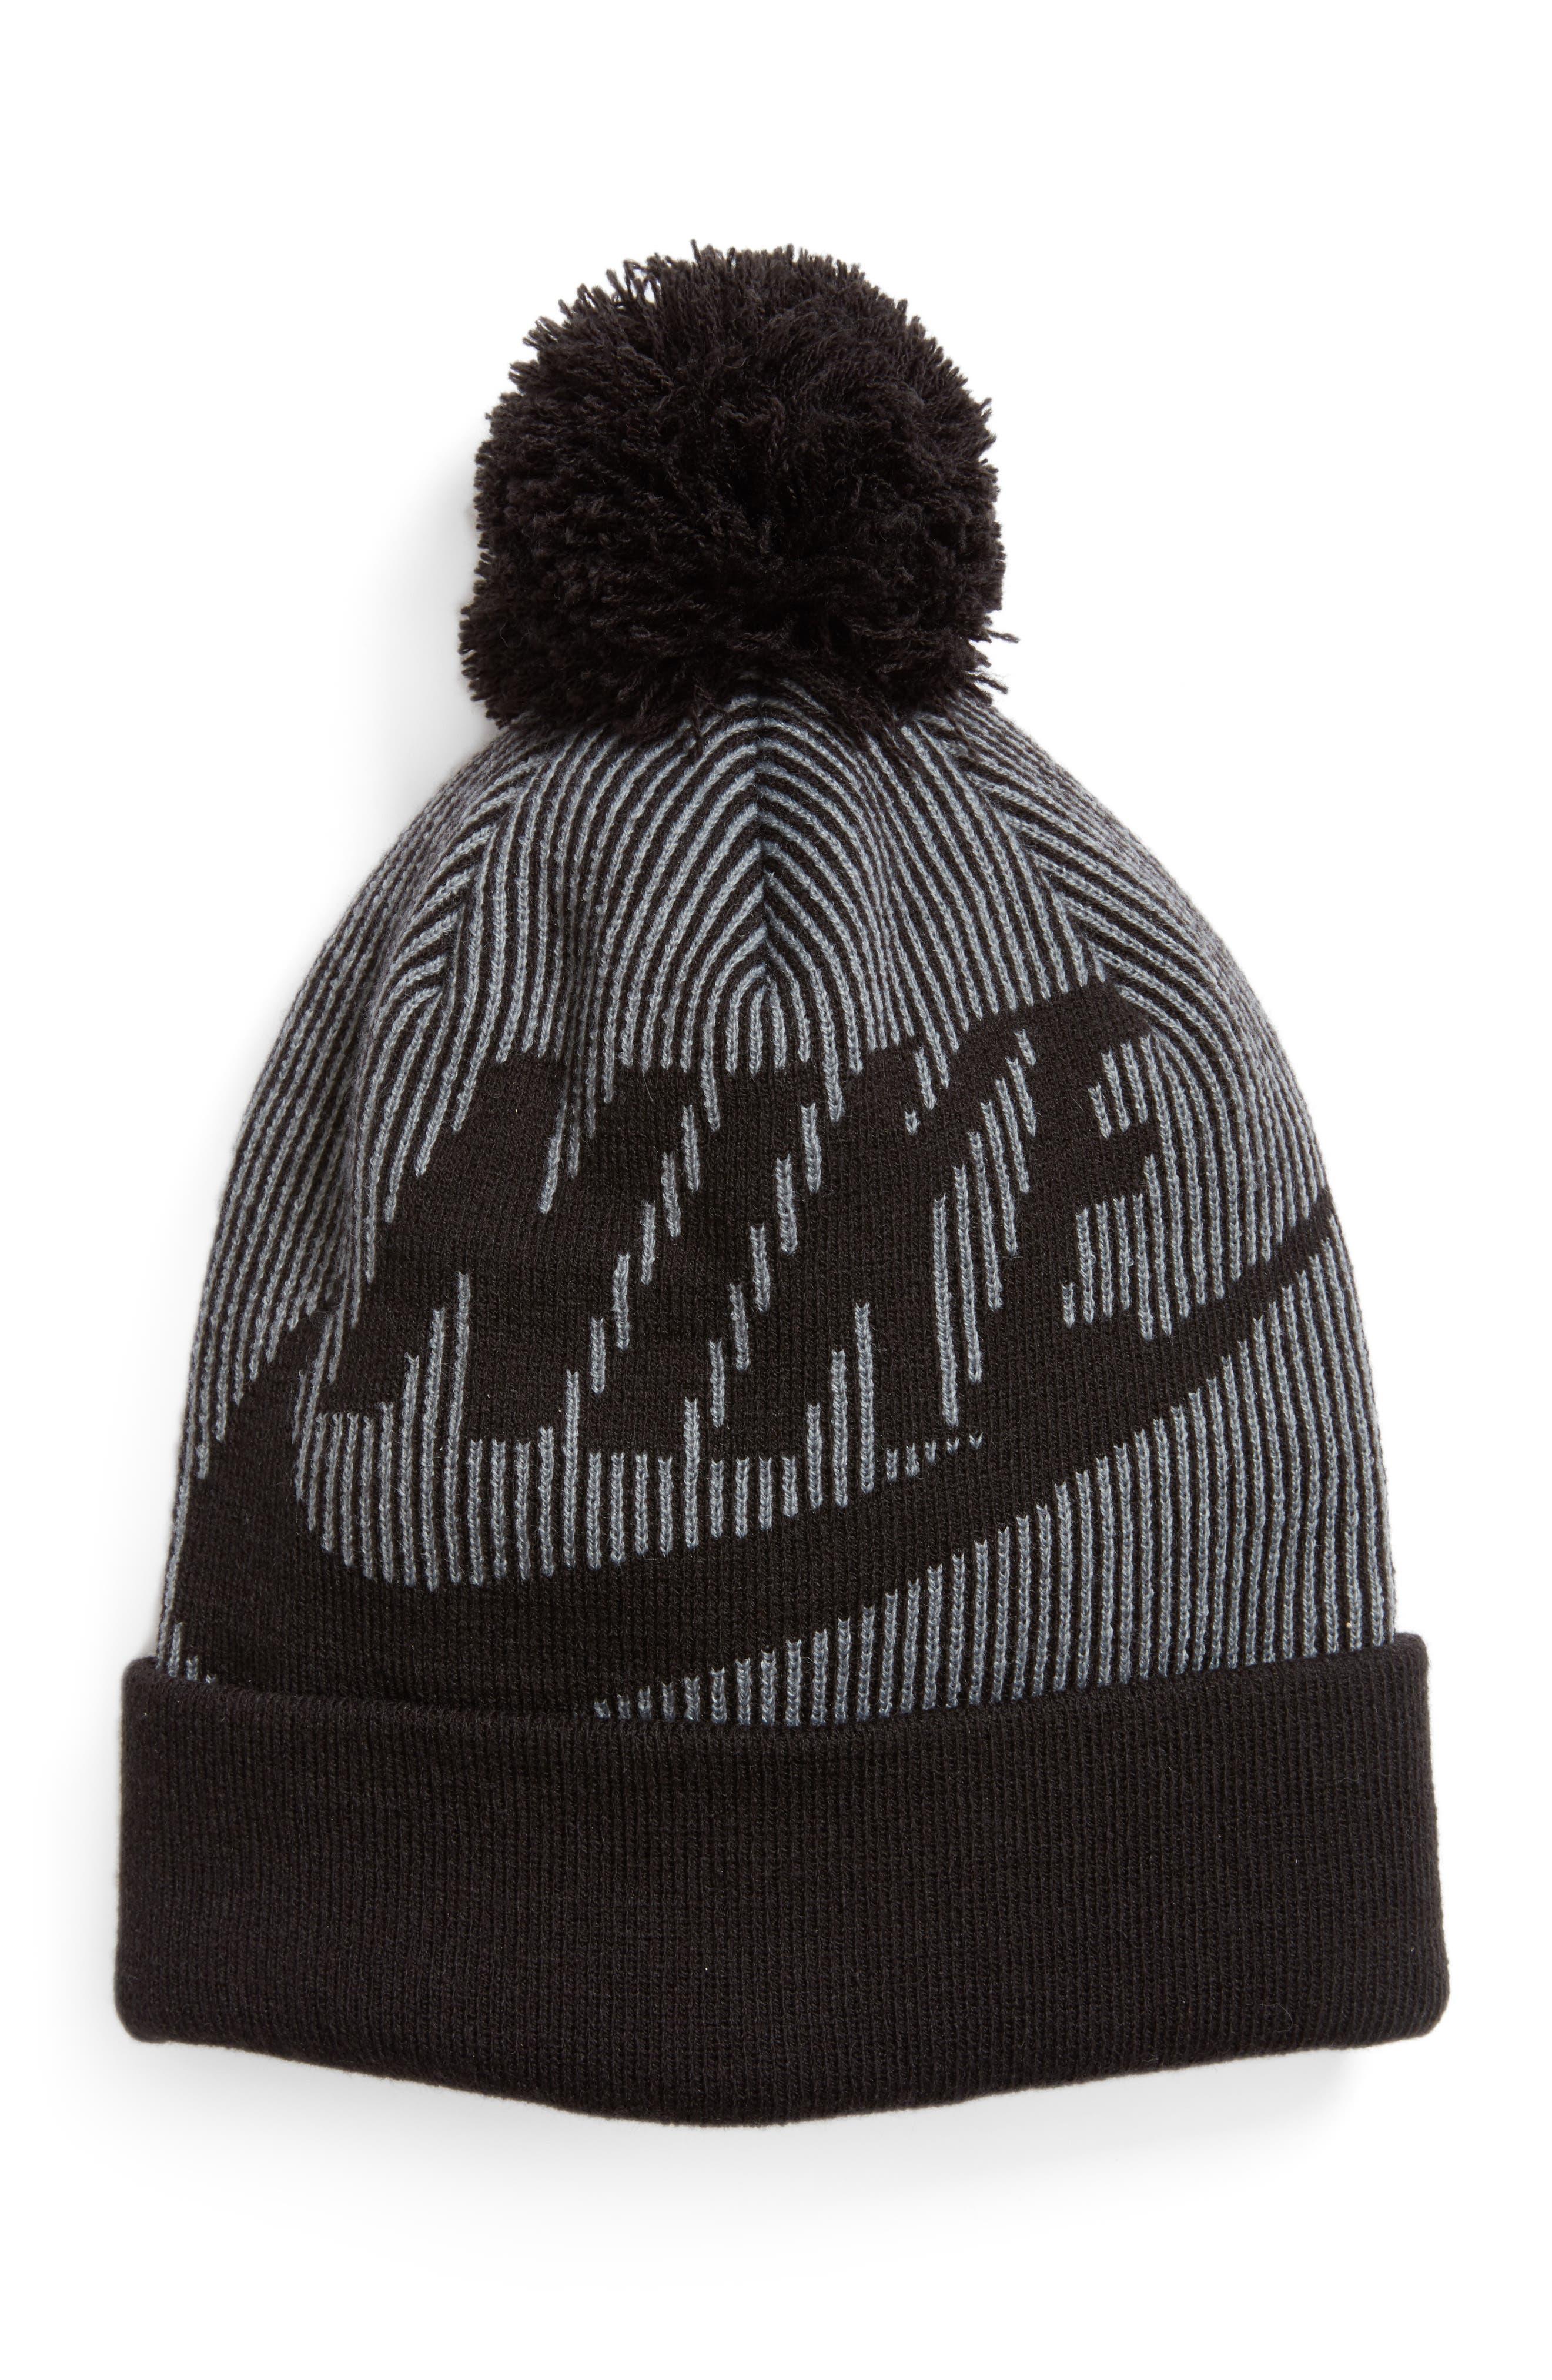 Main Image - Nike Sportswear Beanie with Removable Pom